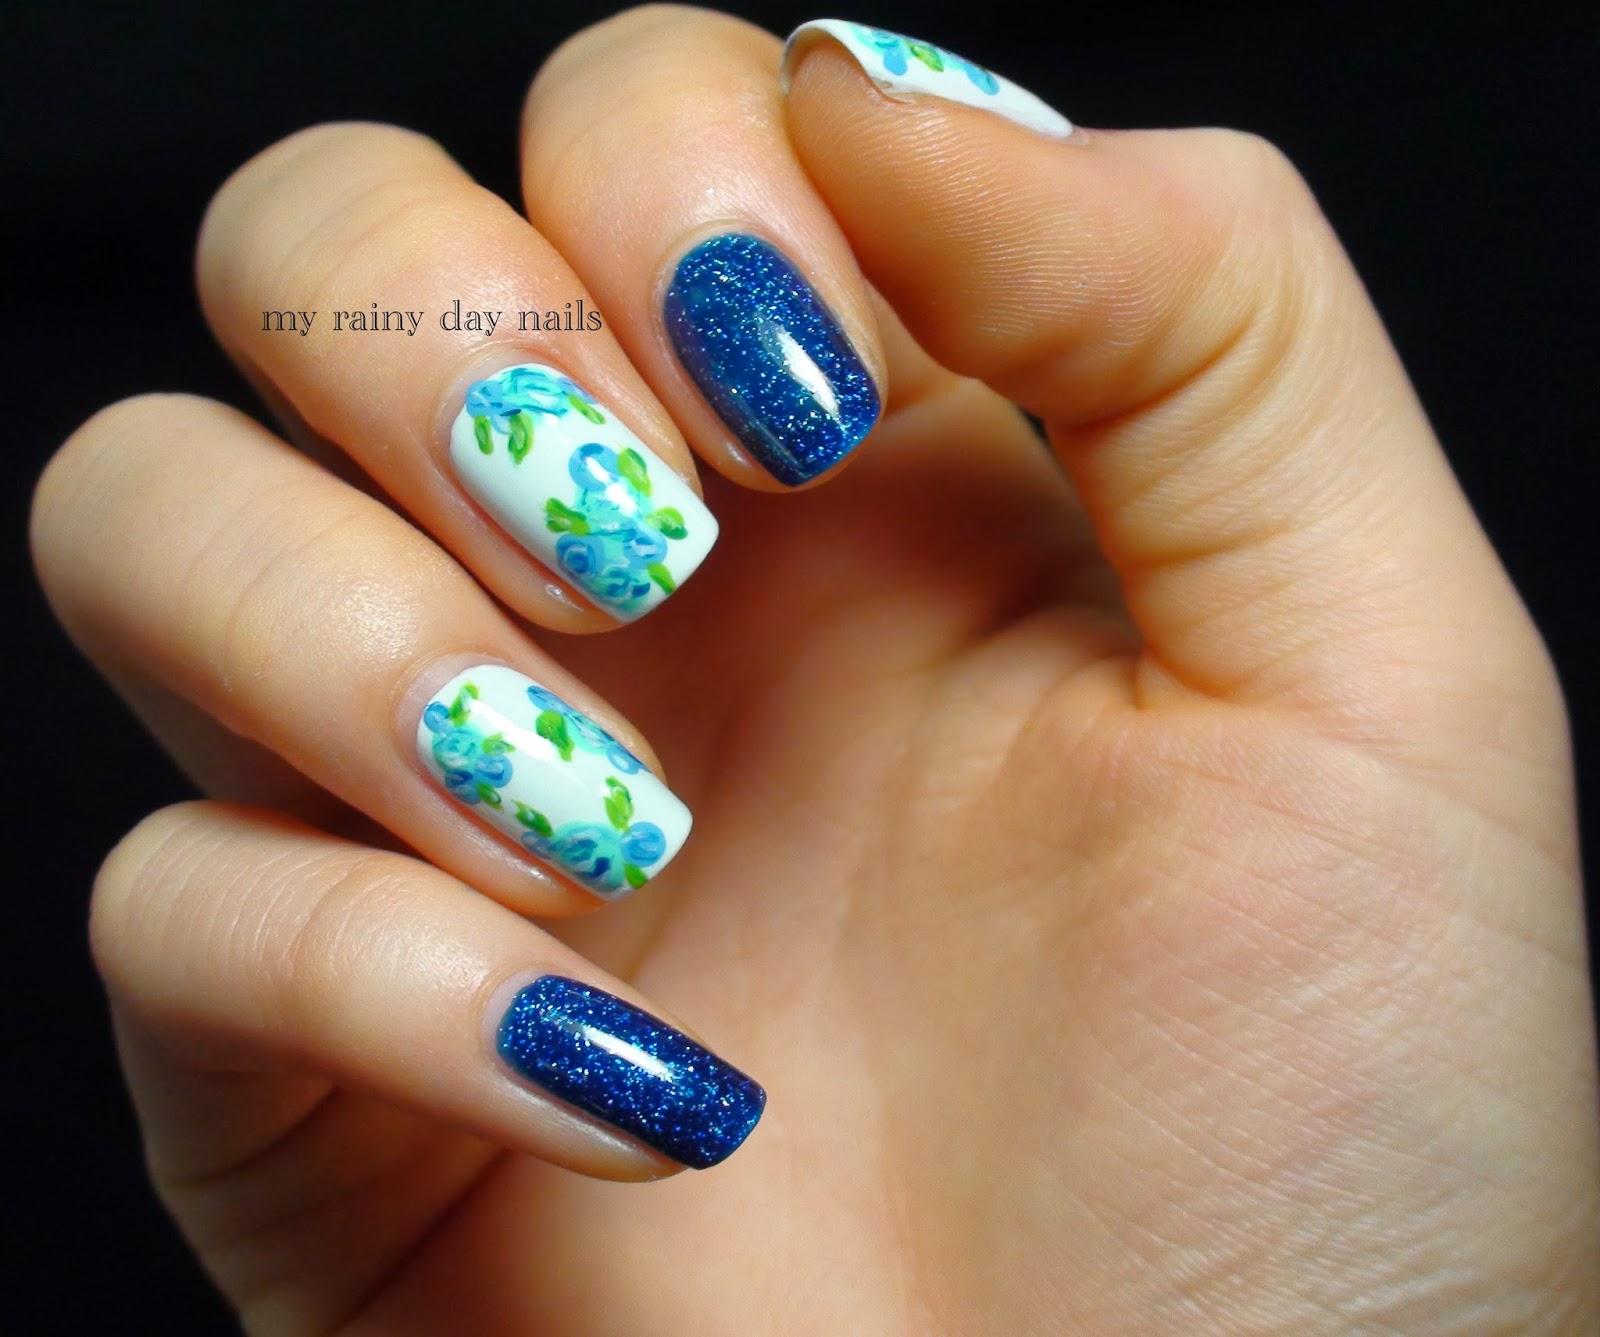 Nail Art February Challenge: My Rainy Day Nails: Nail Art Feb Challenge- Floral